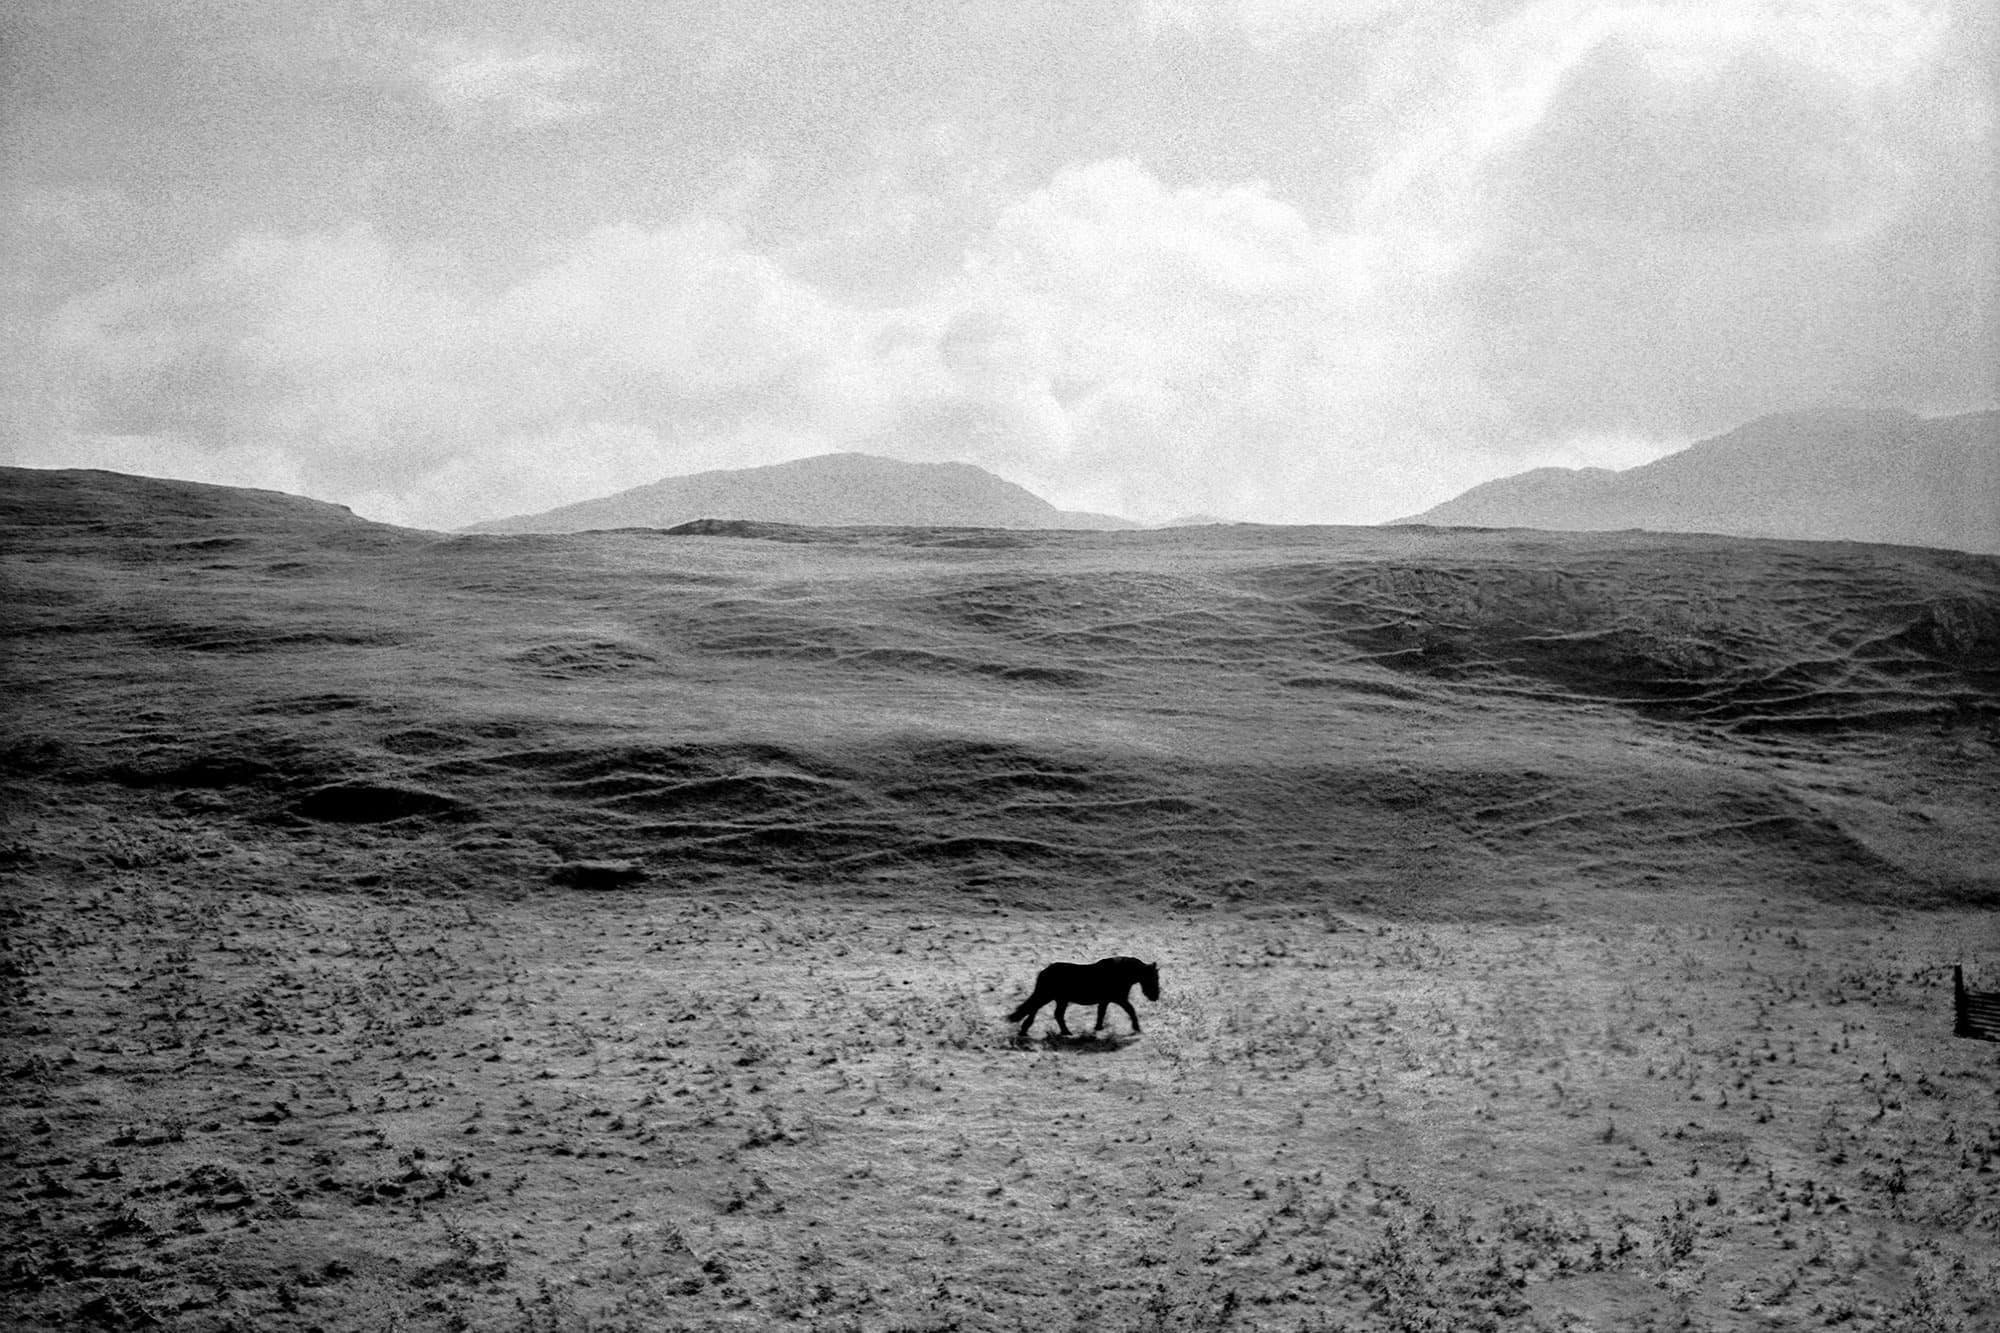 arthur-lazar-Black-Horse-Ullapool